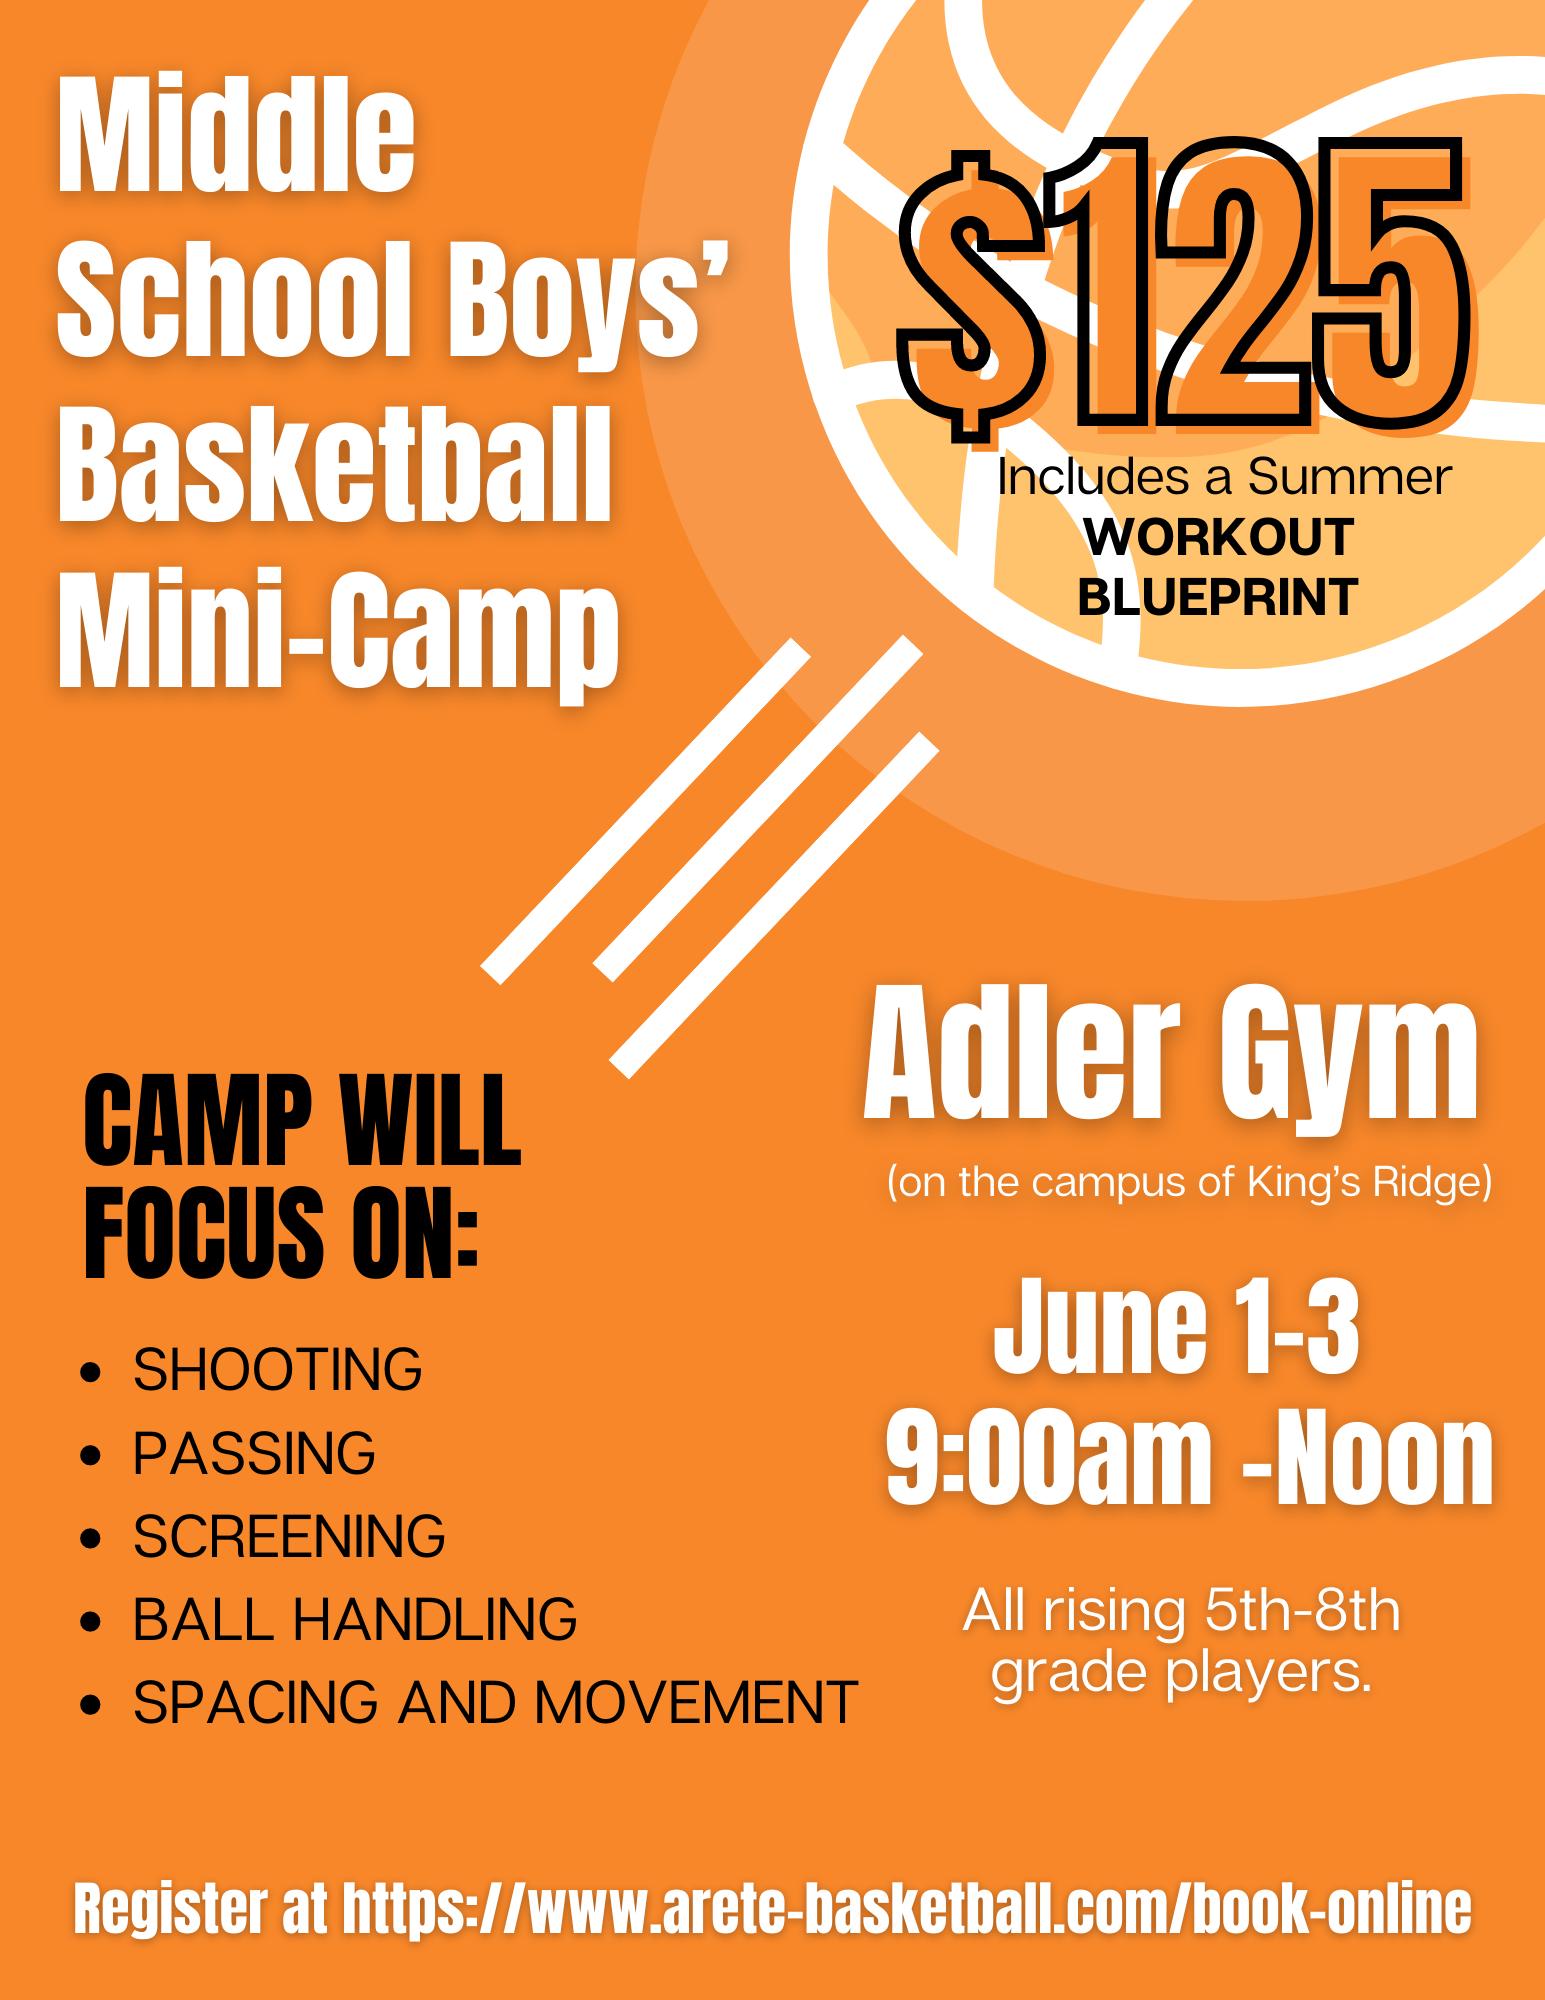 Middle School Boys' Basketball Mini-Camp